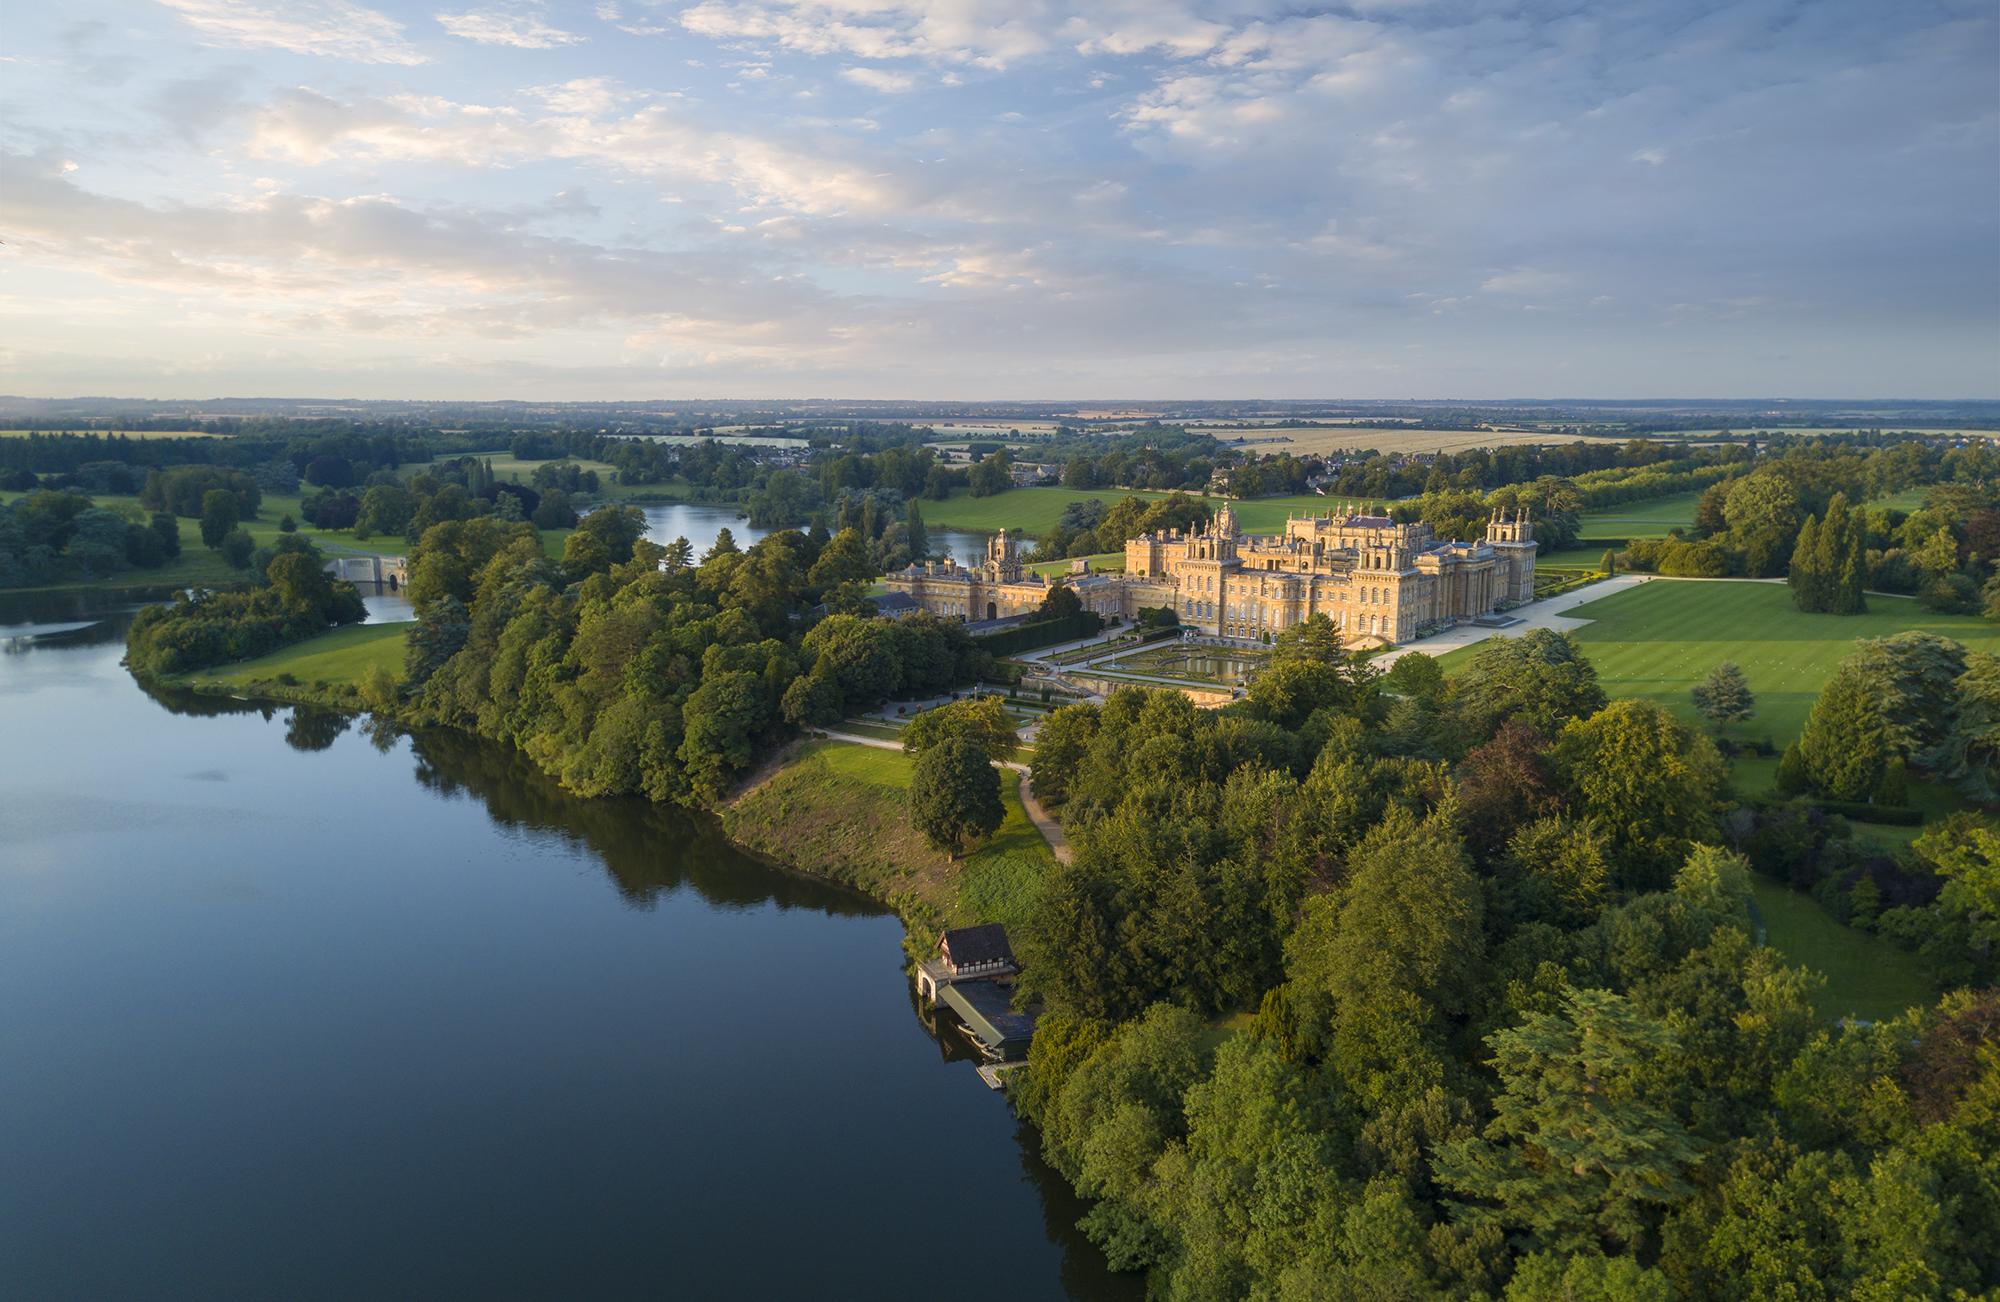 Blenheim Palace 2017